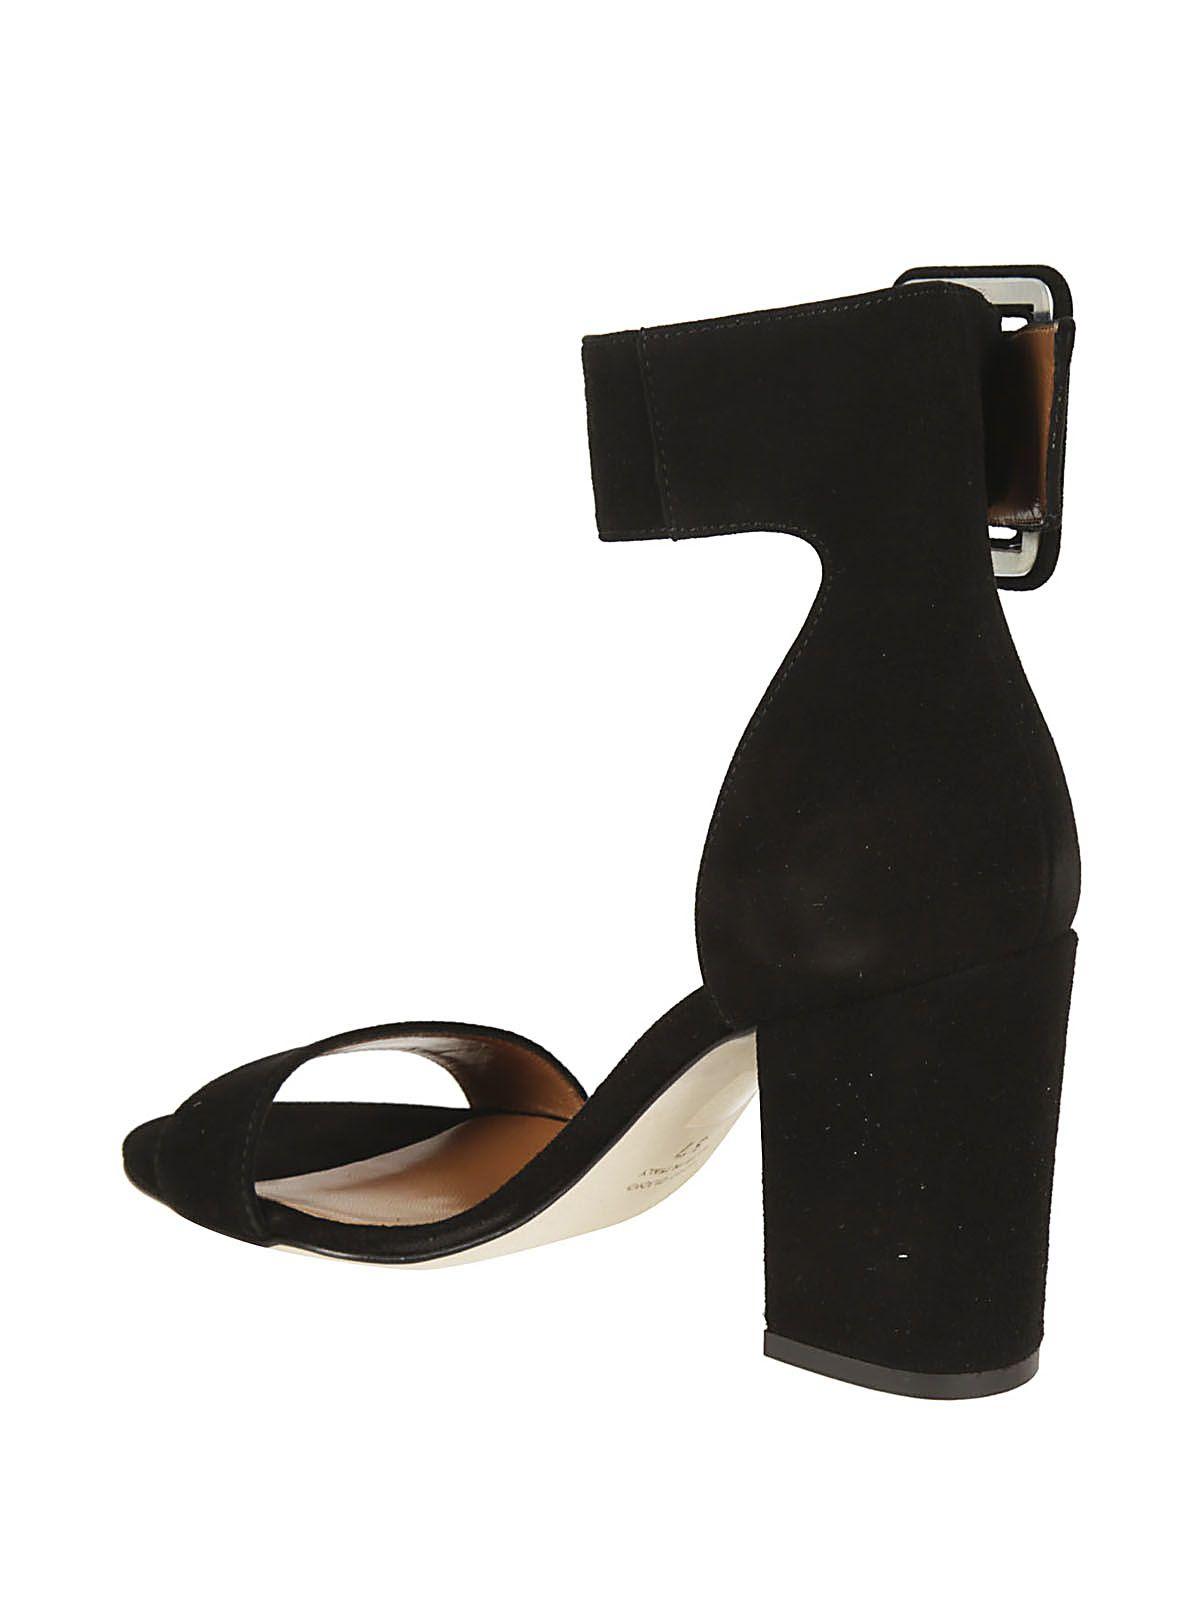 buckle ankle strap sandals - Black PARIS TEXAS 8quGK52aY